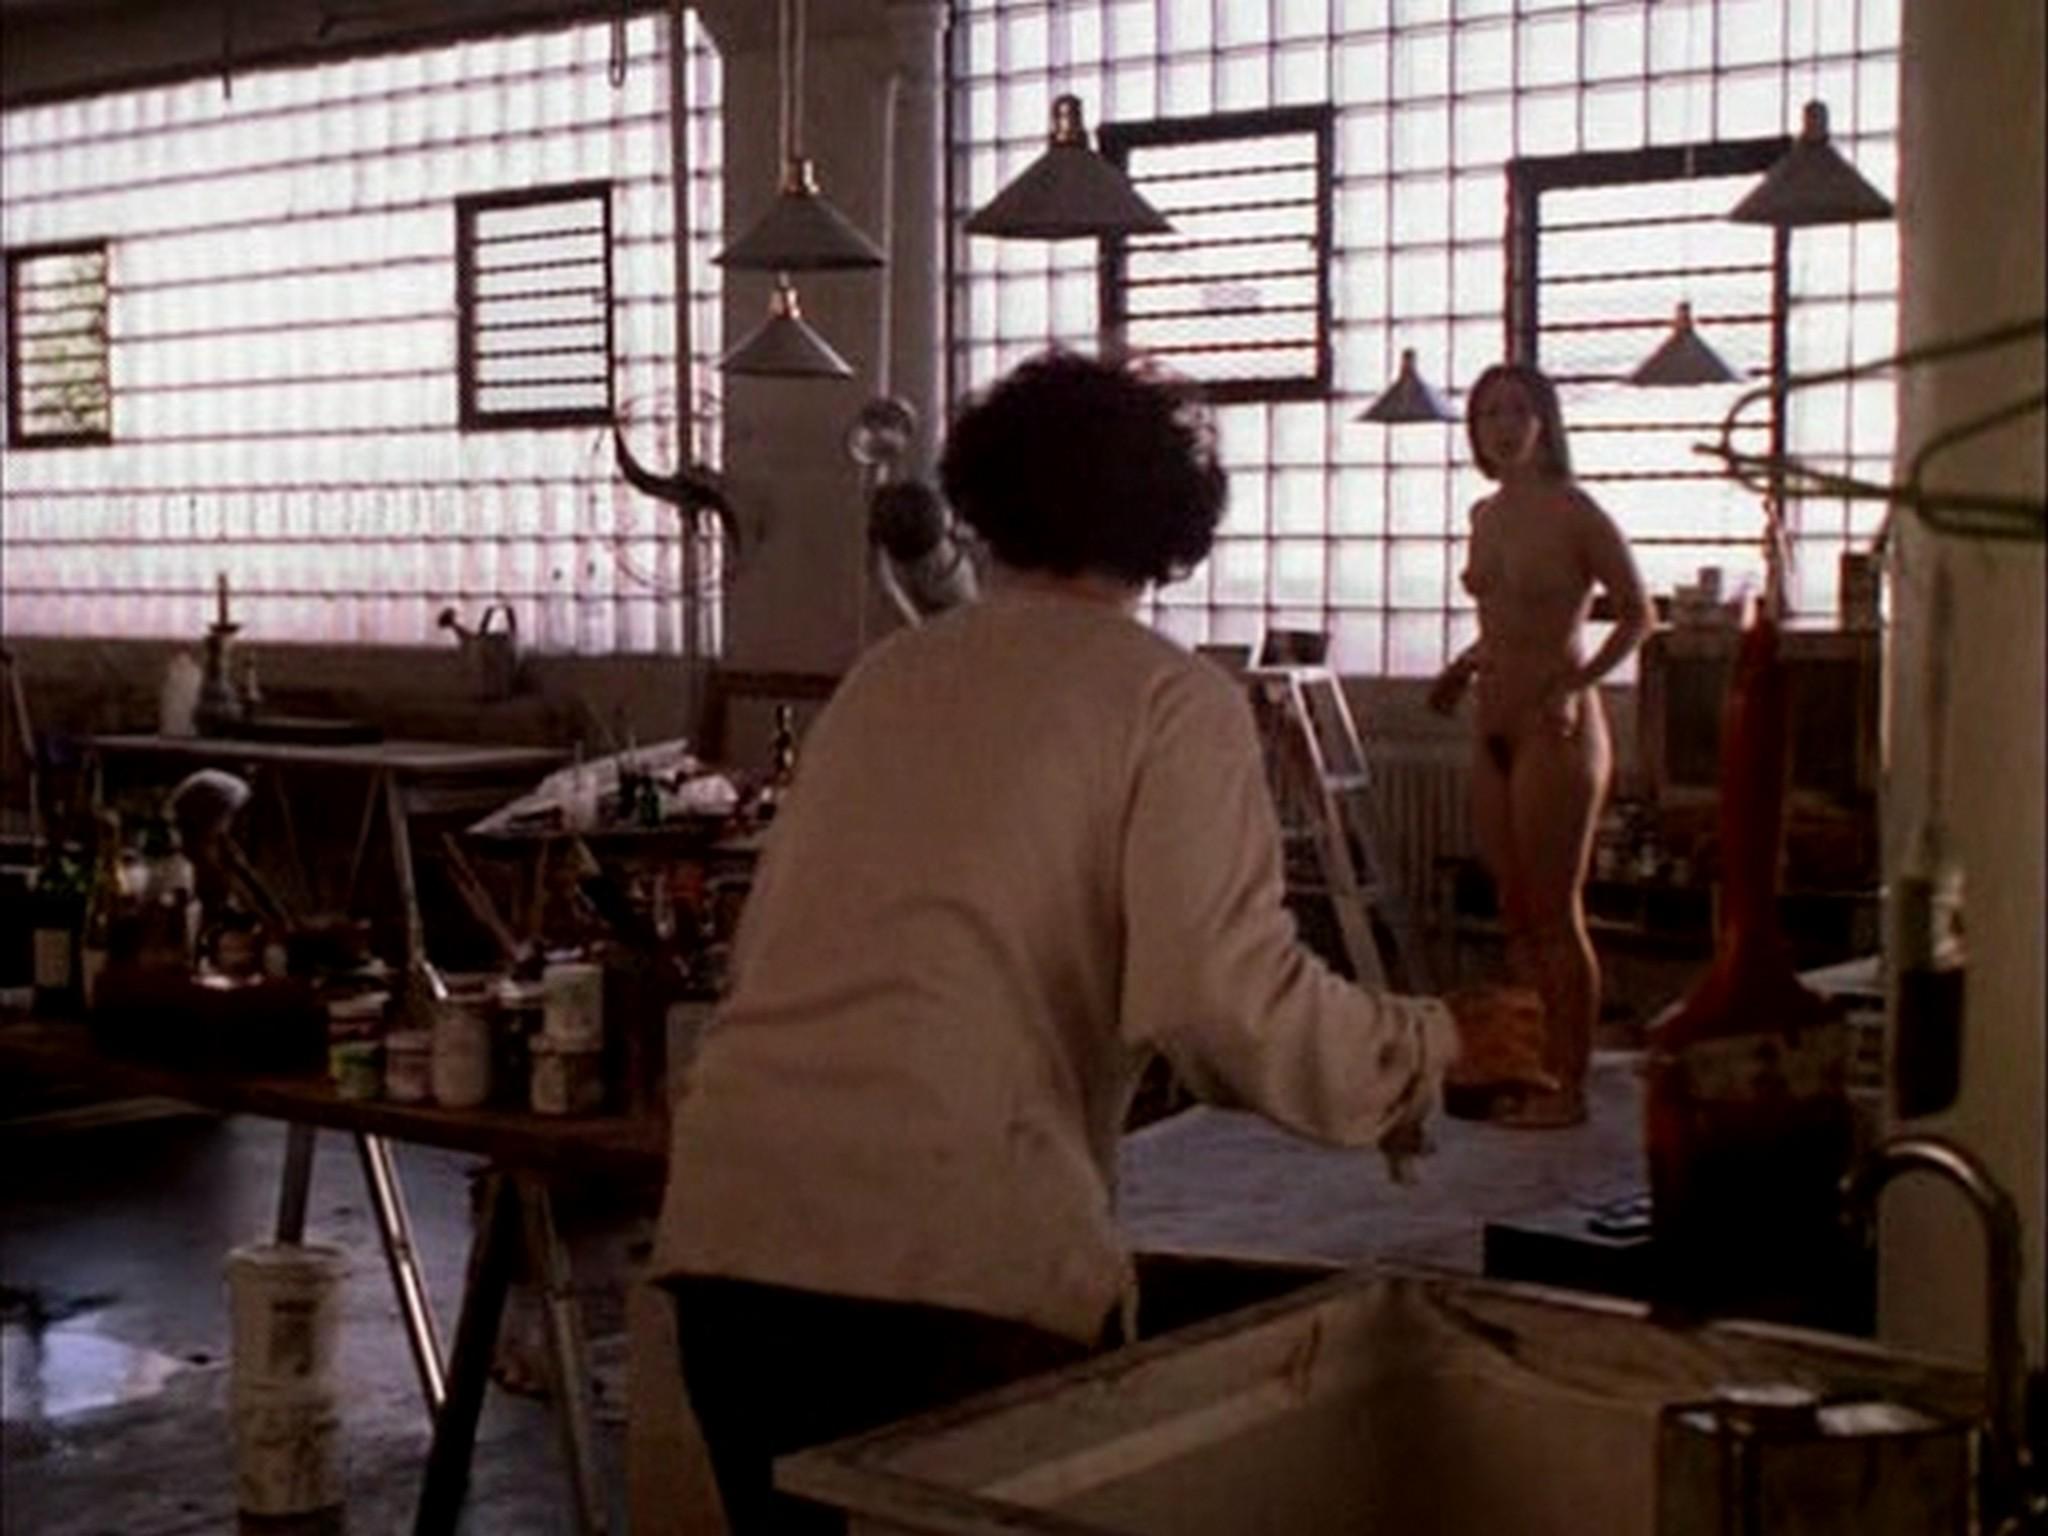 Laura Linney nude full frontal bush and Sheila Zane nude - Maze (2000) (13)